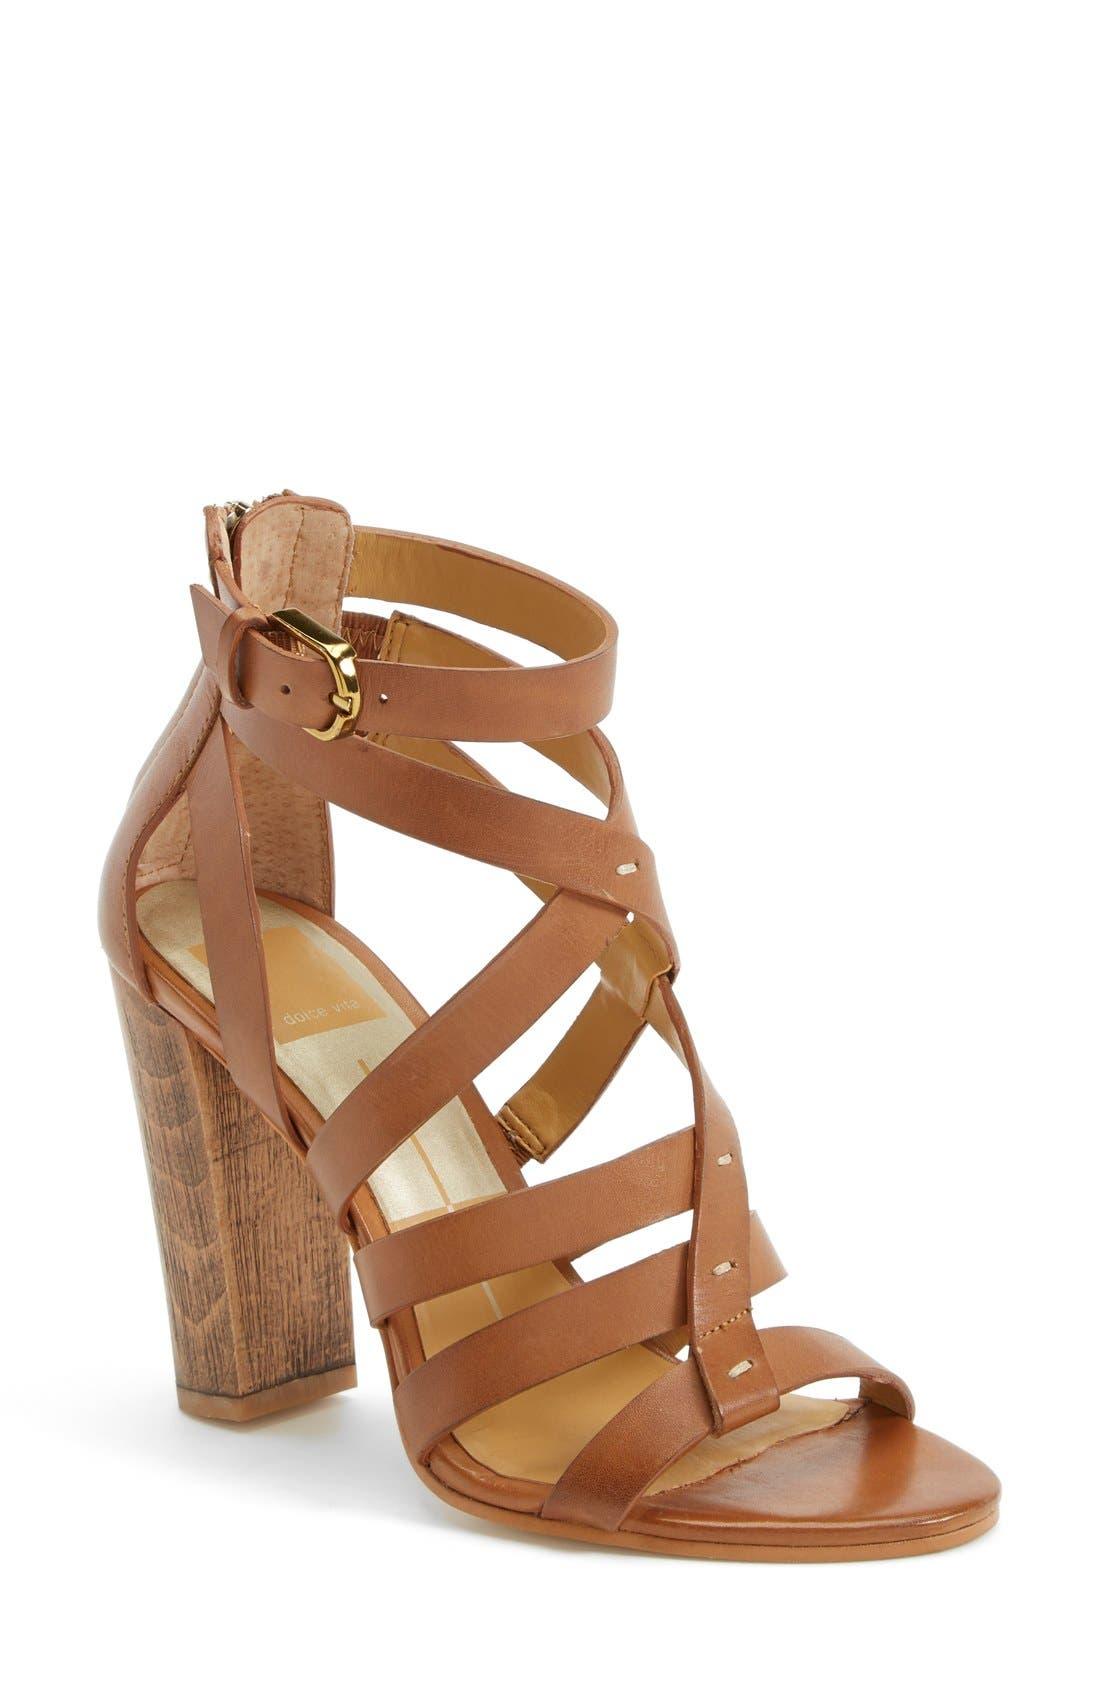 Alternate Image 1 Selected - Dolce Vita 'Nolin' Leather Sandal (Women)